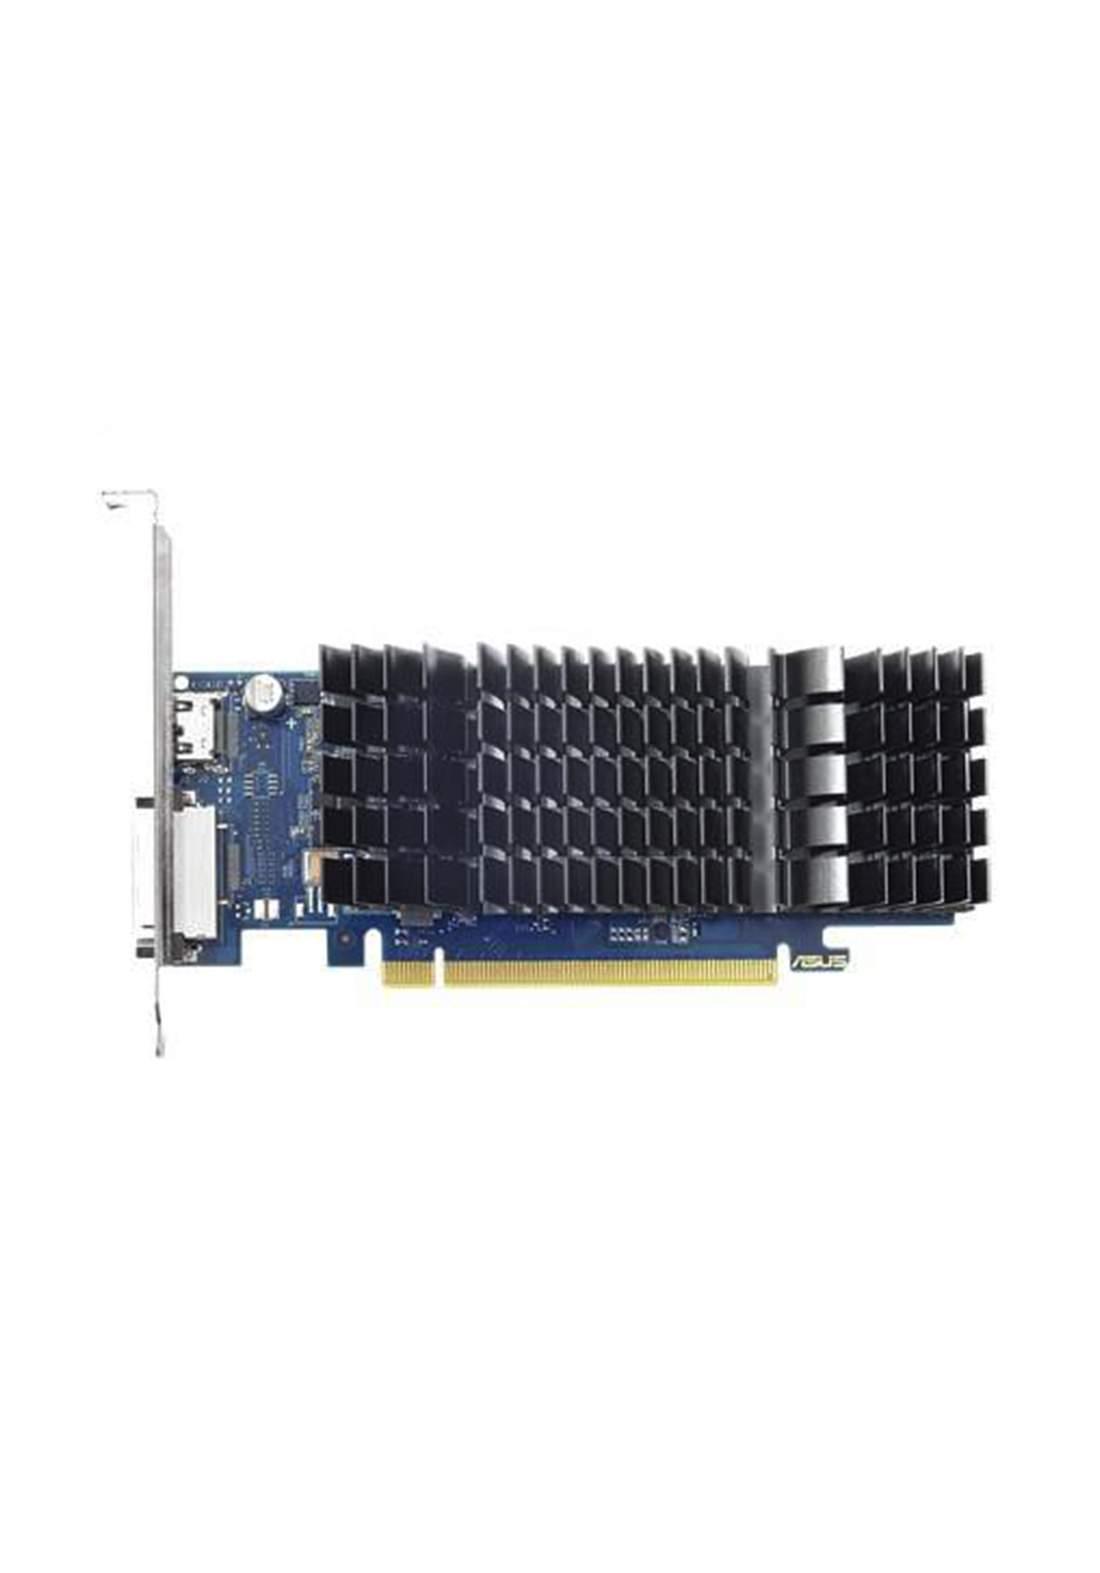 Asus GeForce GT 1030 2 GB Graphics Card